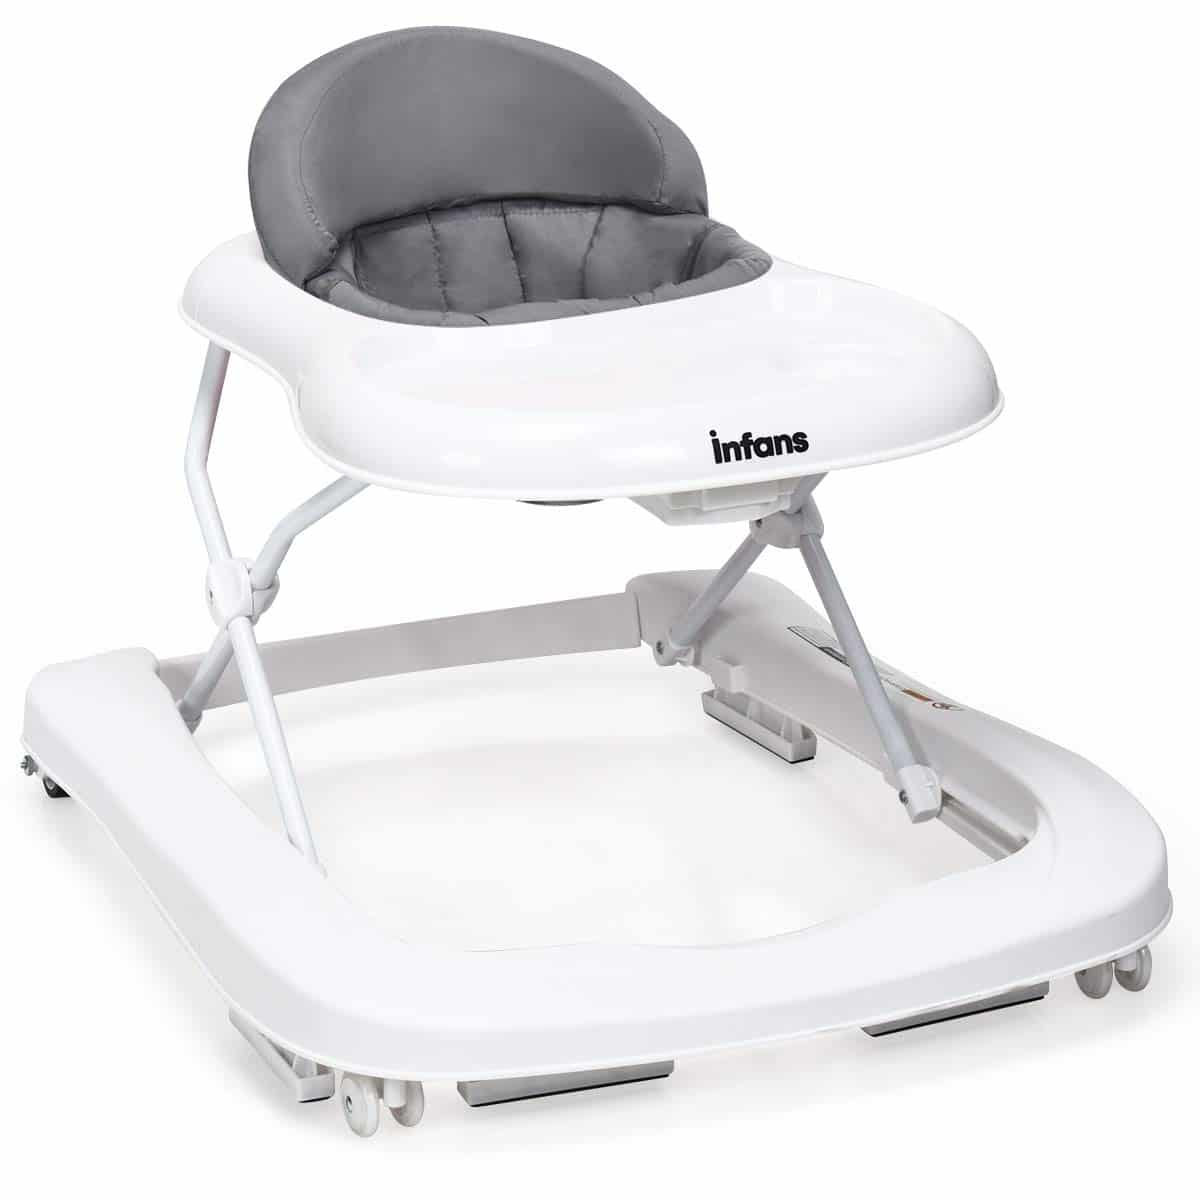 INFANS Foldable Unisex Baby Walker